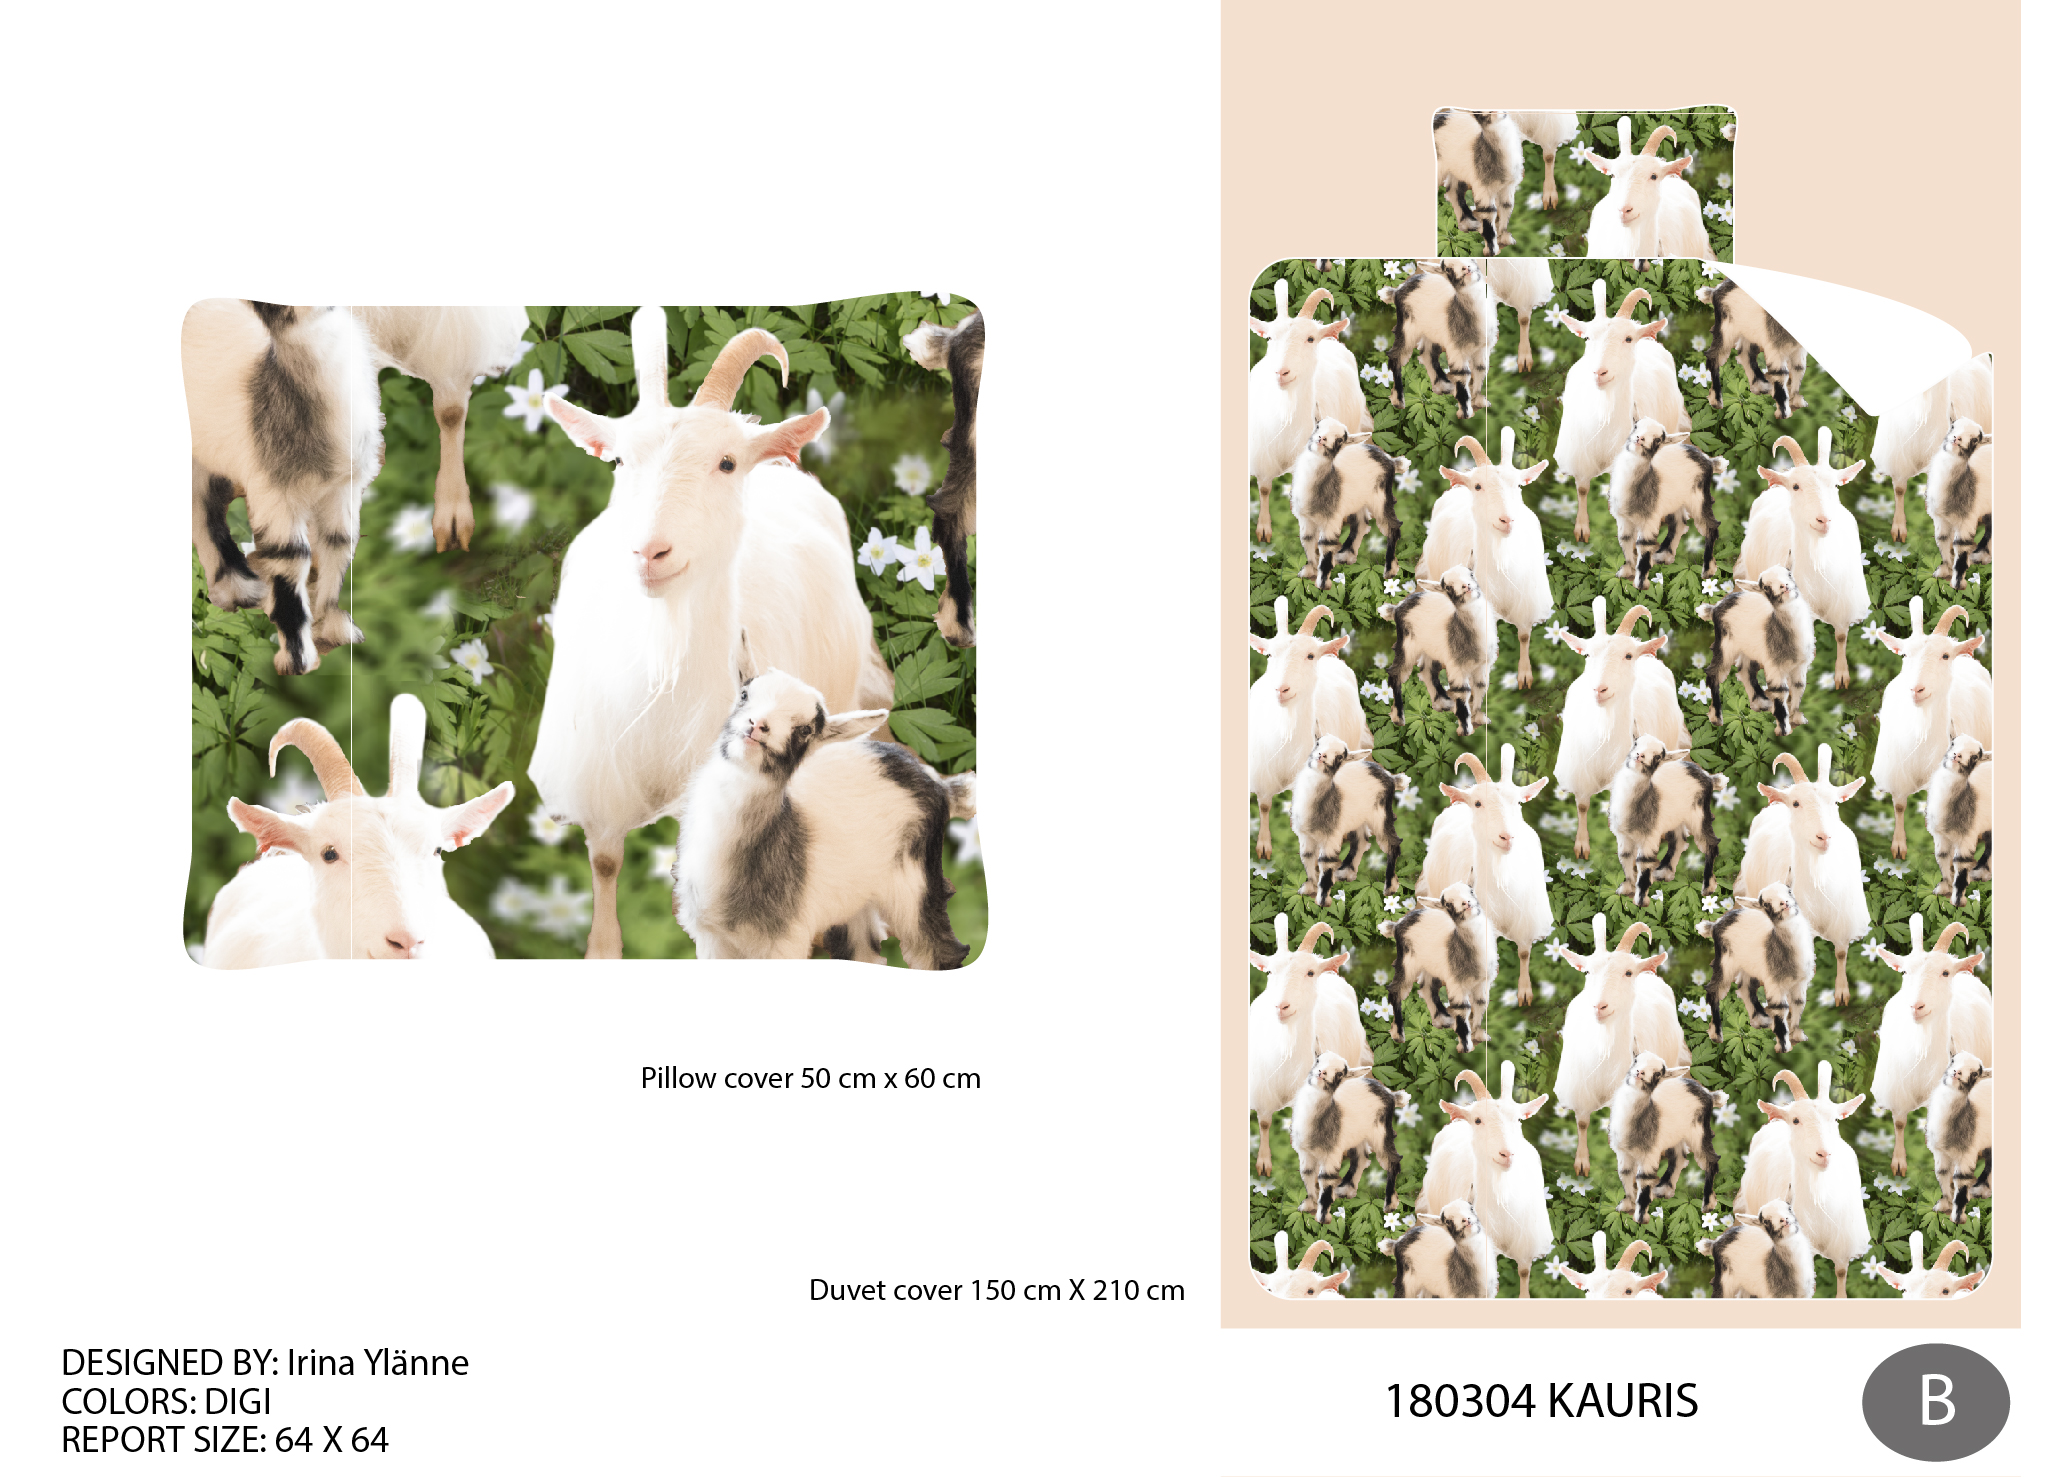 irina 180304 KAURIS-02